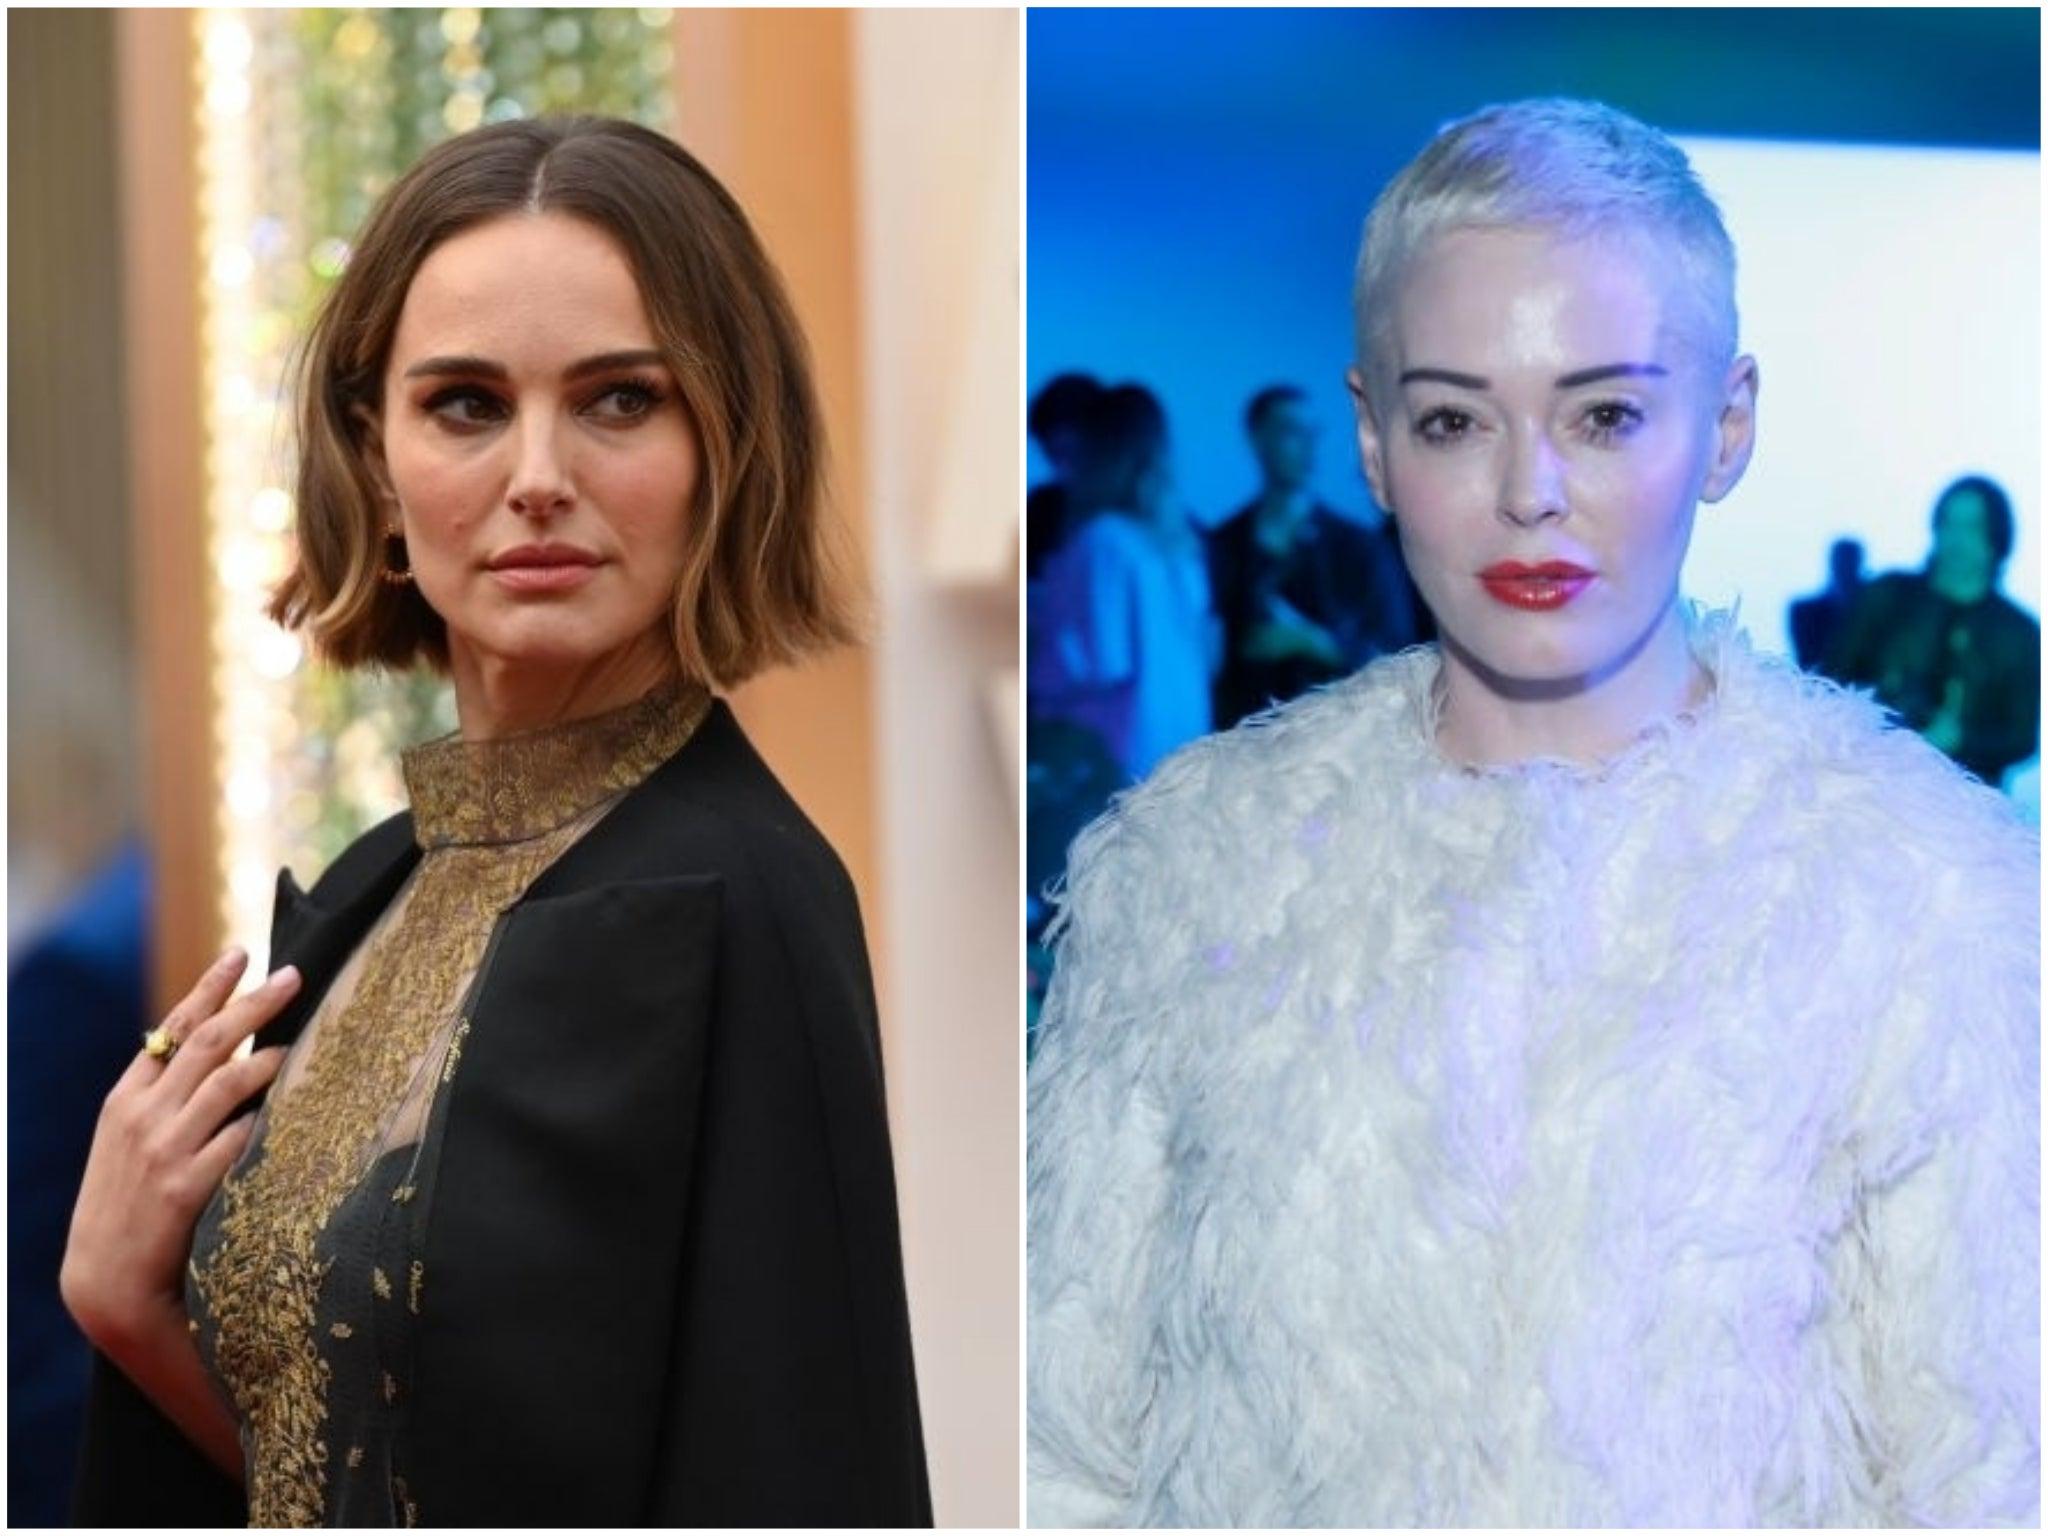 Rose McGowan says she regrets condemning Natalie Portman's feminist Oscar dress